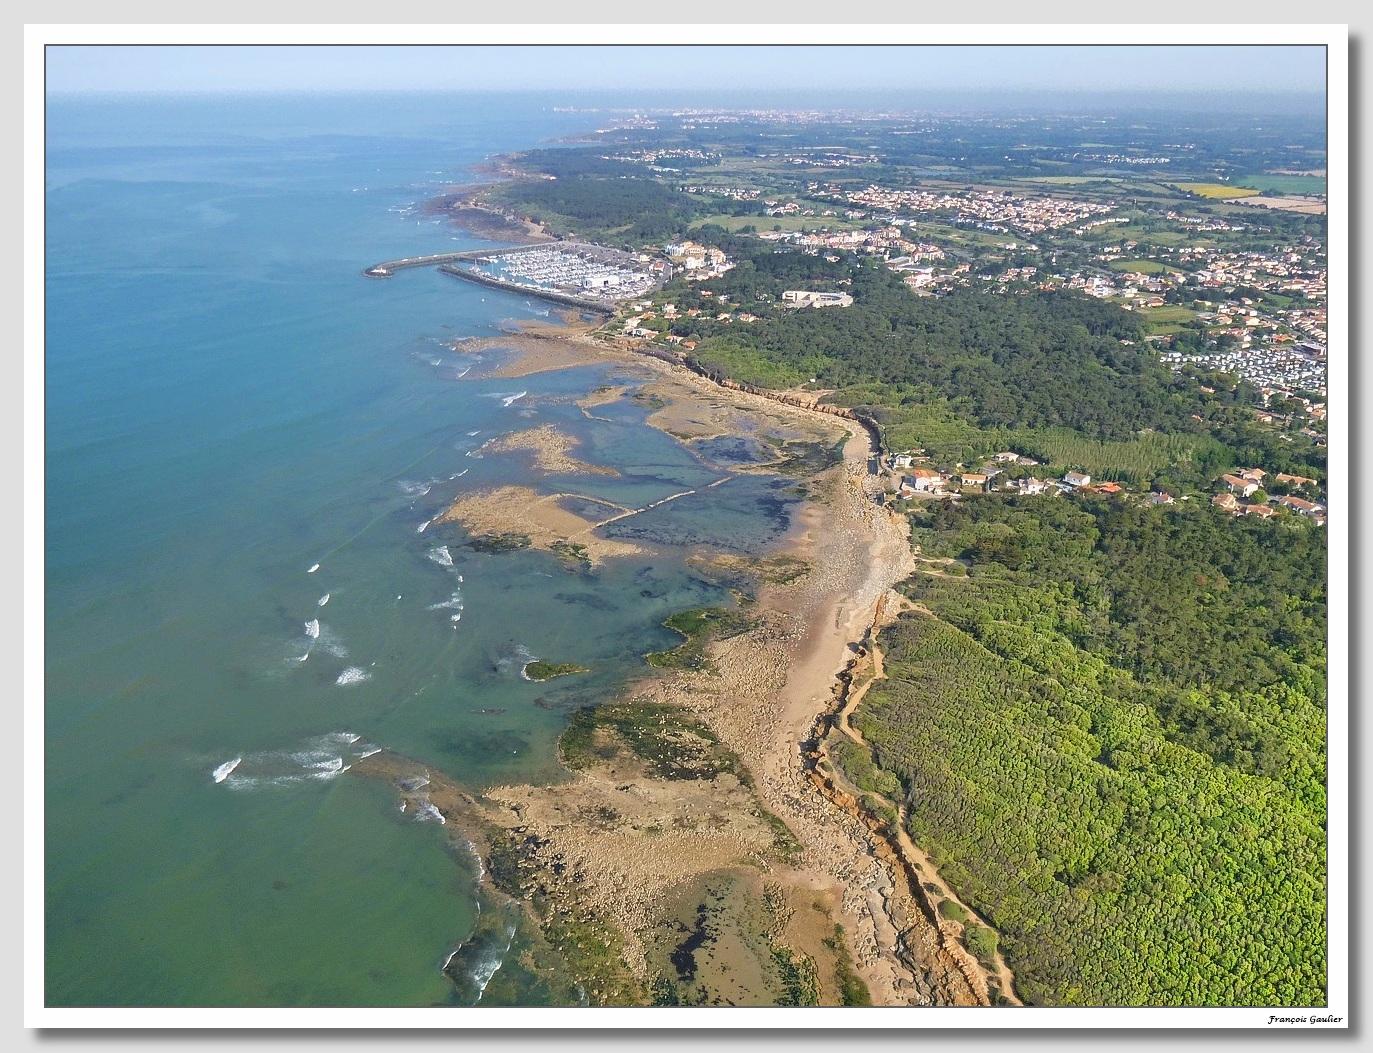 Le littoral talmondais